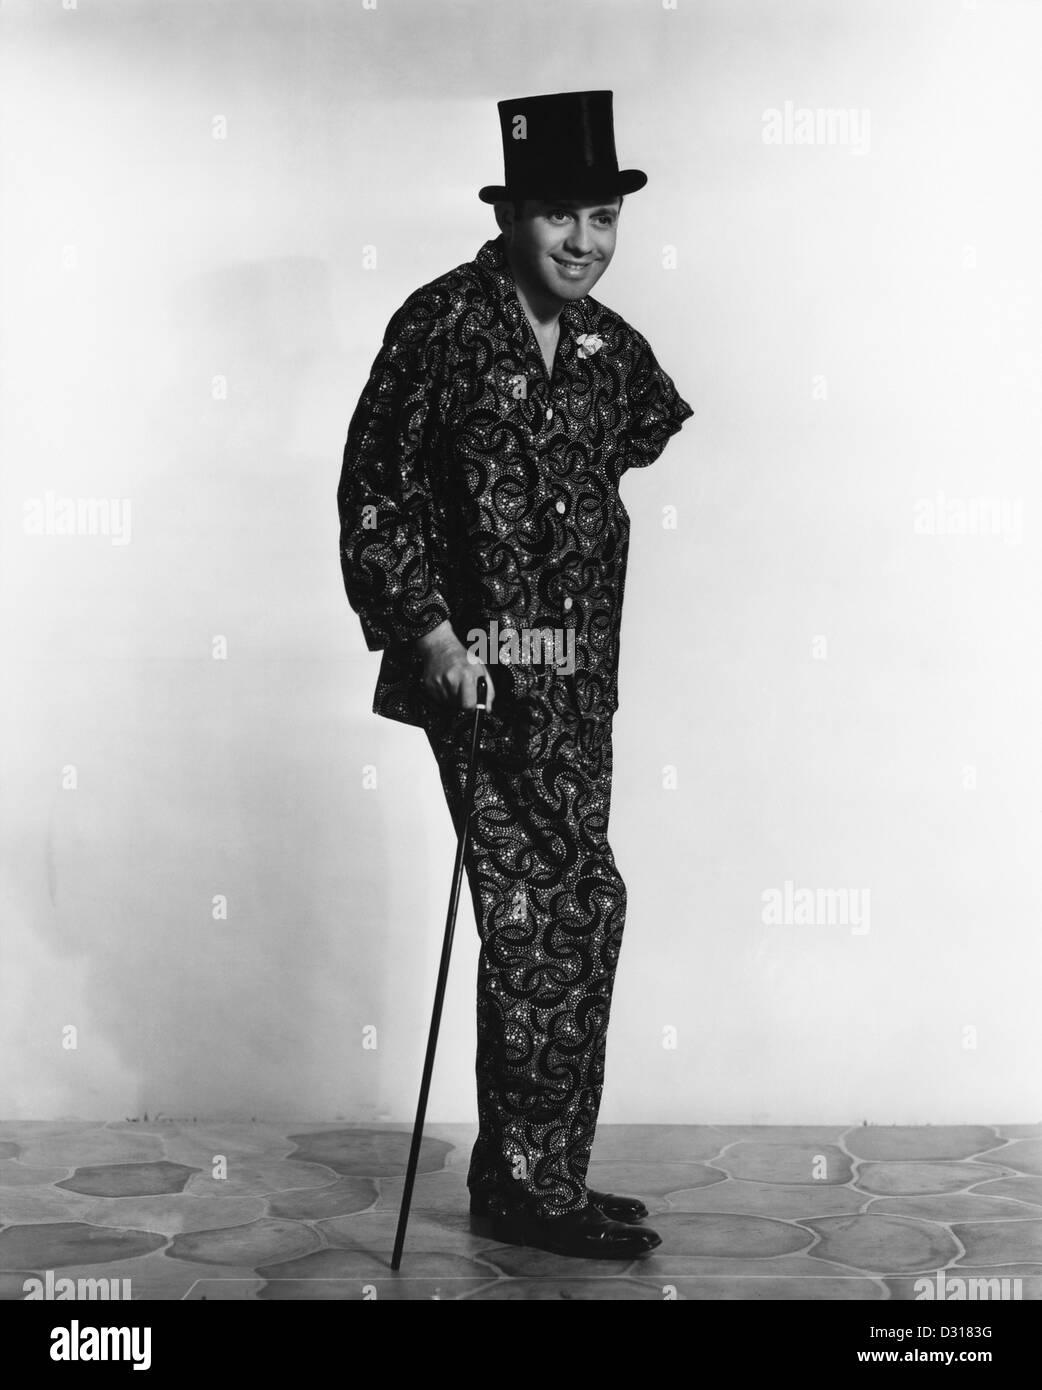 Jack Benny - Stock Image